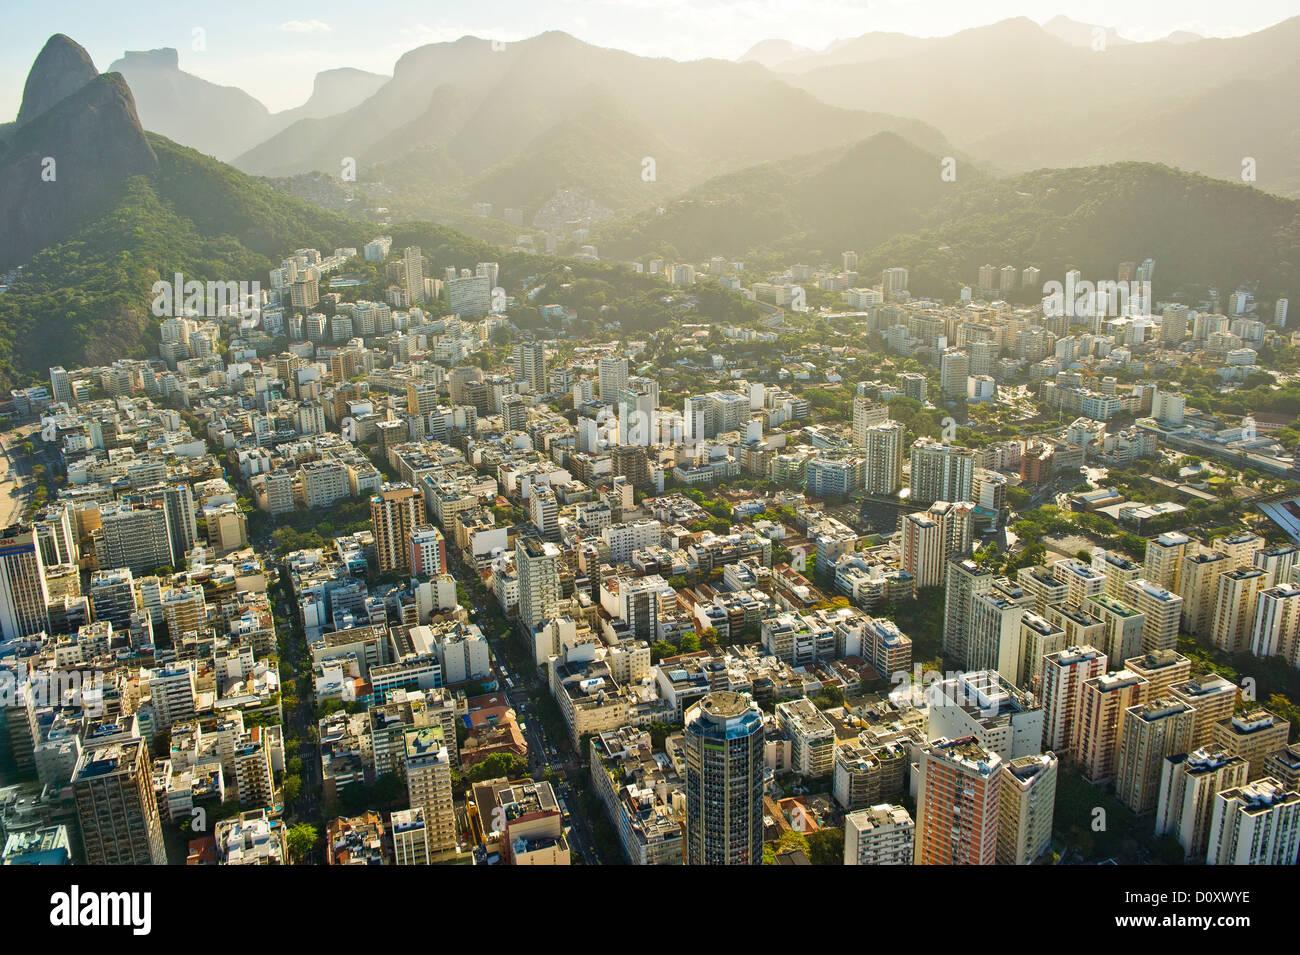 Vista aérea de barrios de Río de Janeiro, Brasil Imagen De Stock